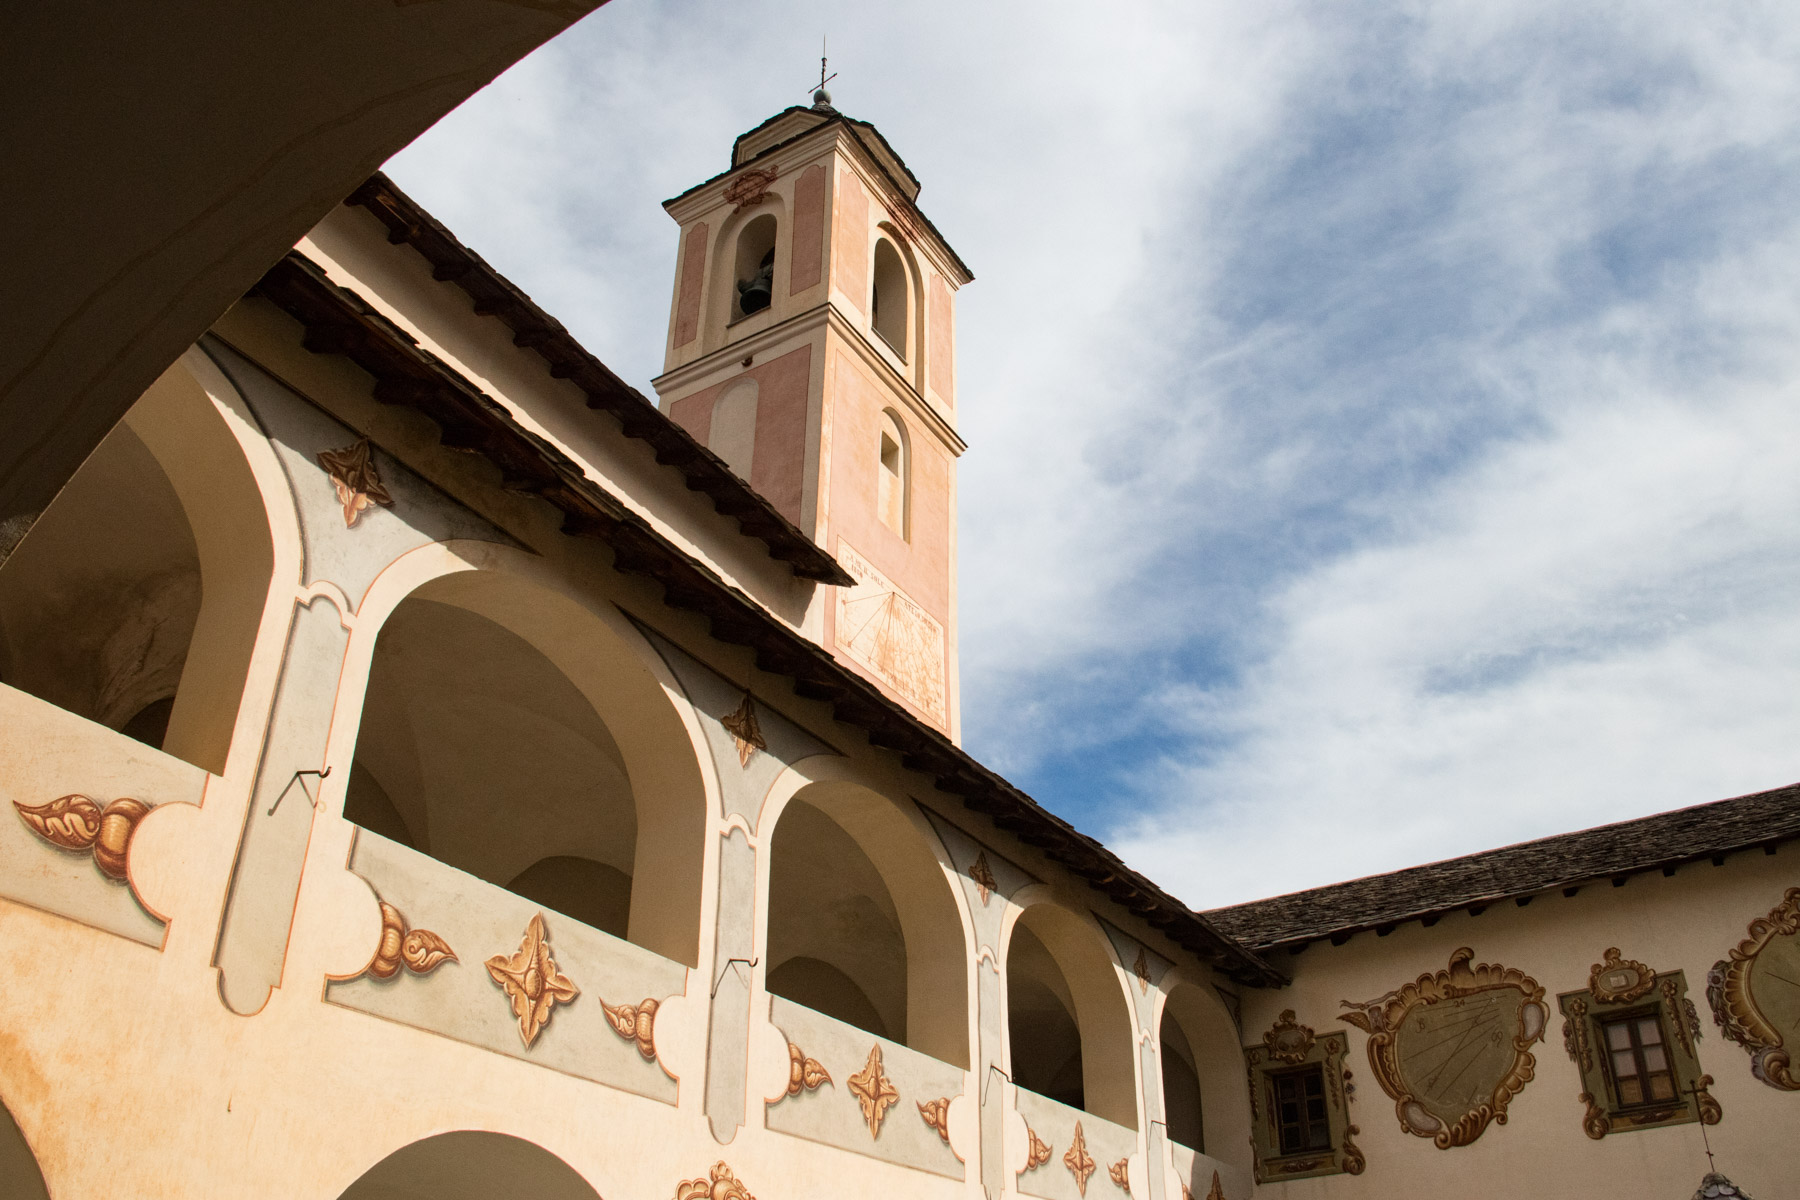 De kloostergang in het klooster van Saorge